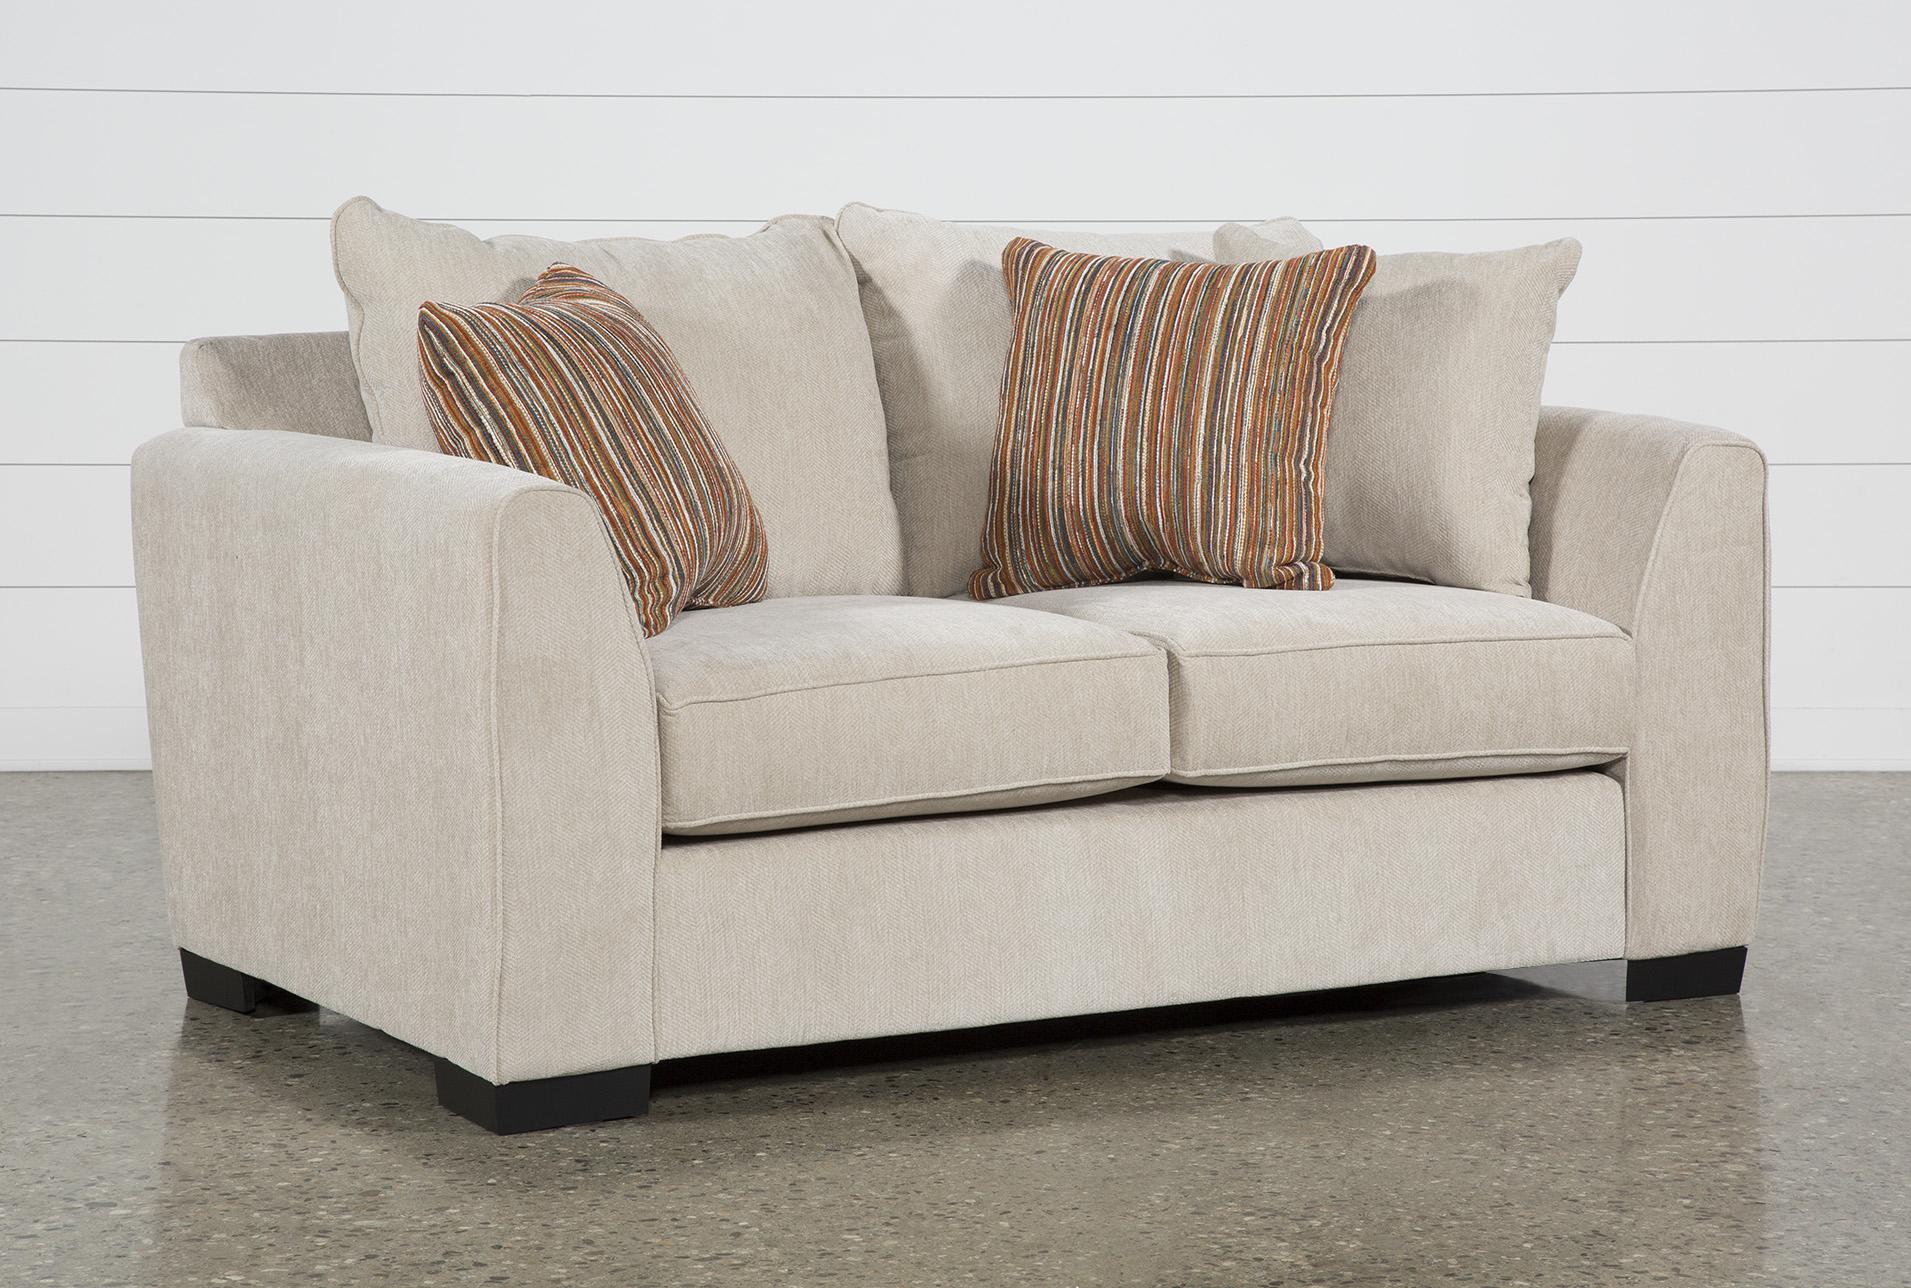 Sheldon Ii Loveseat Products In 2019 Sofa Furniture Pillows